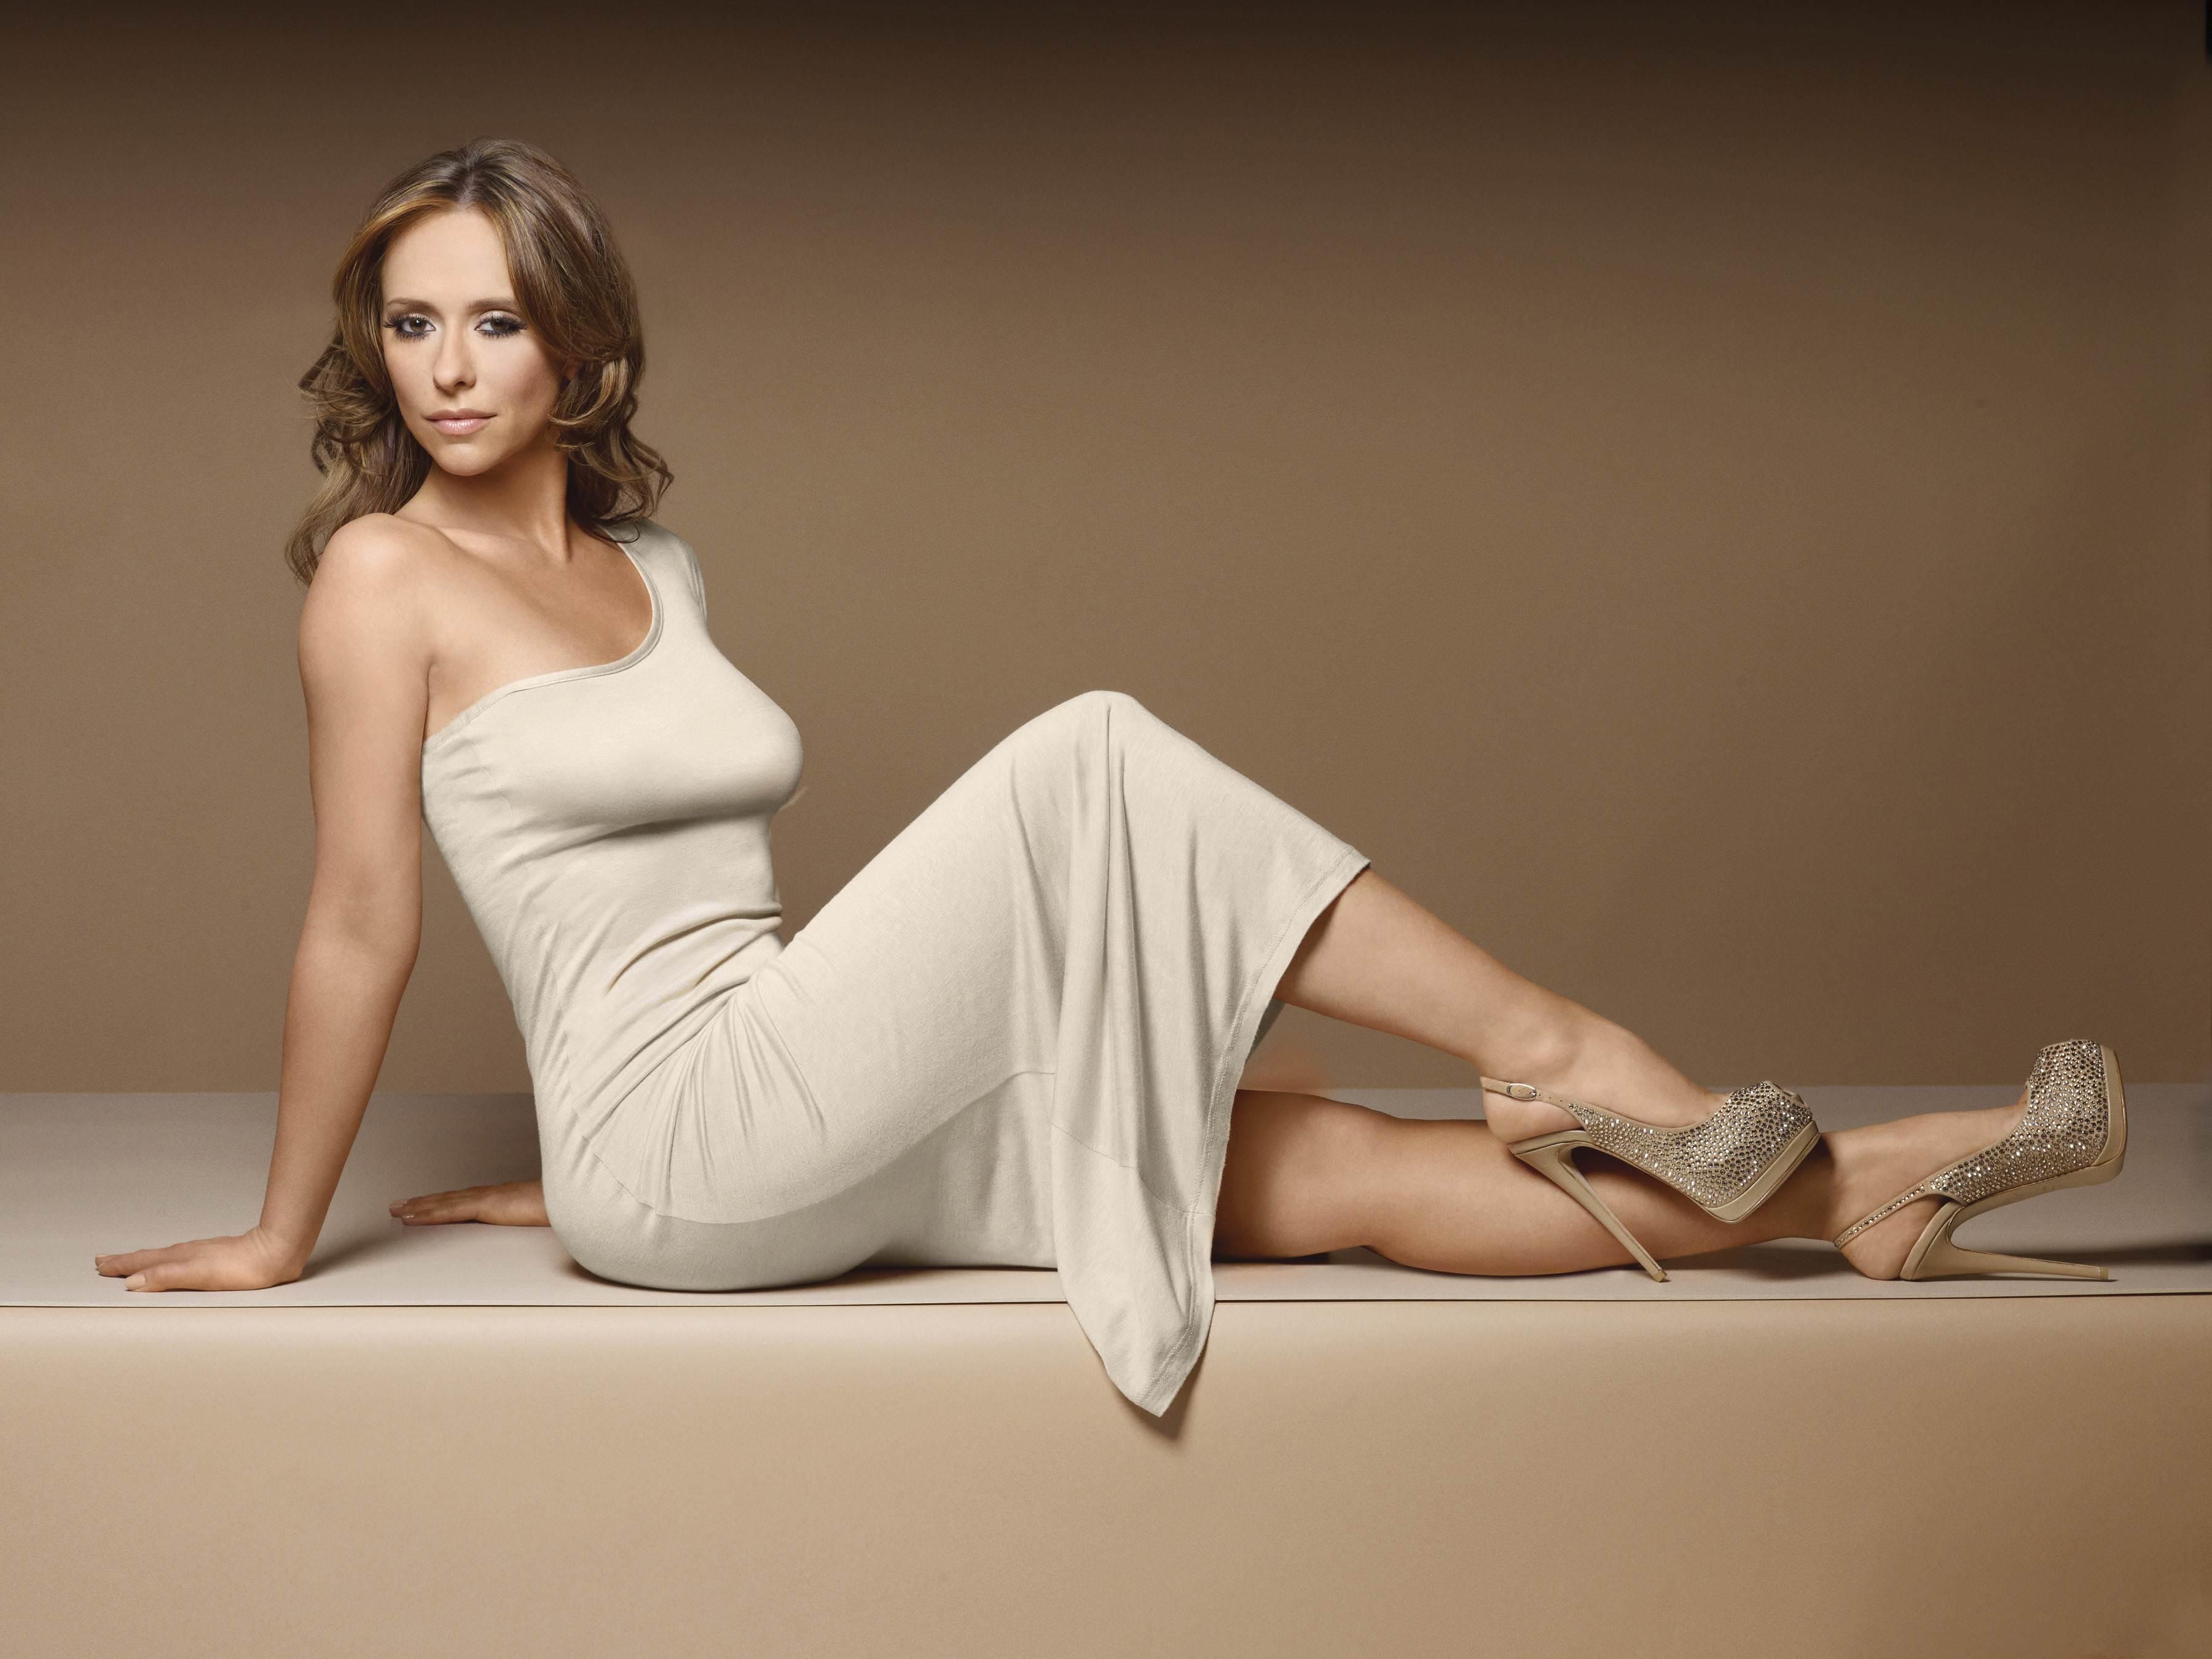 Jennifer Love Hewitt 4k Hd Celebrities 4k Wallpapers Images